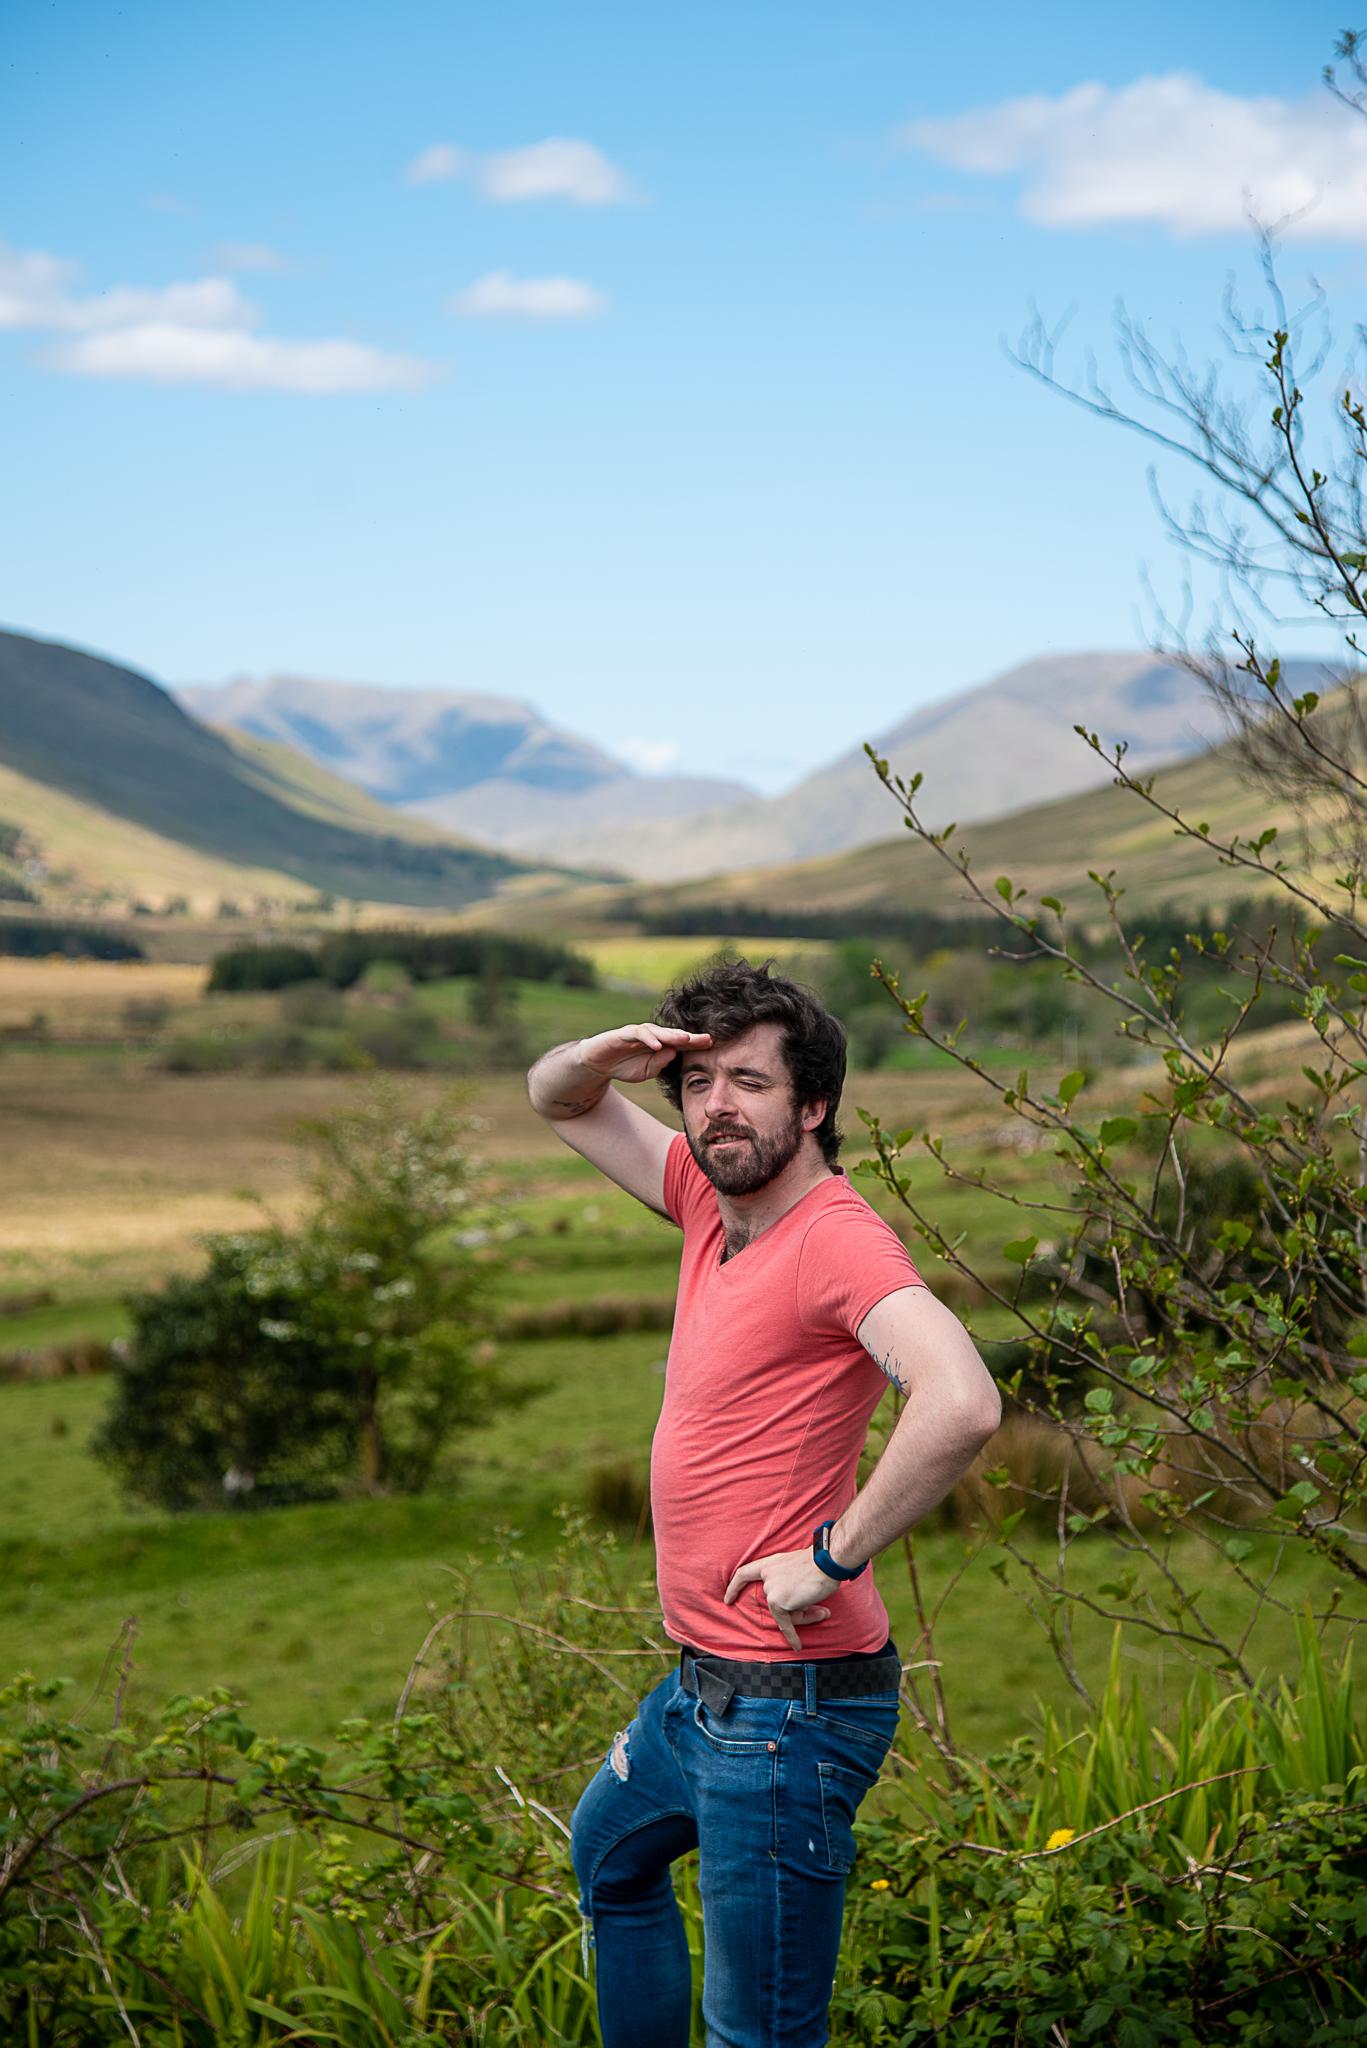 eoghan, connemara , summer, ireland